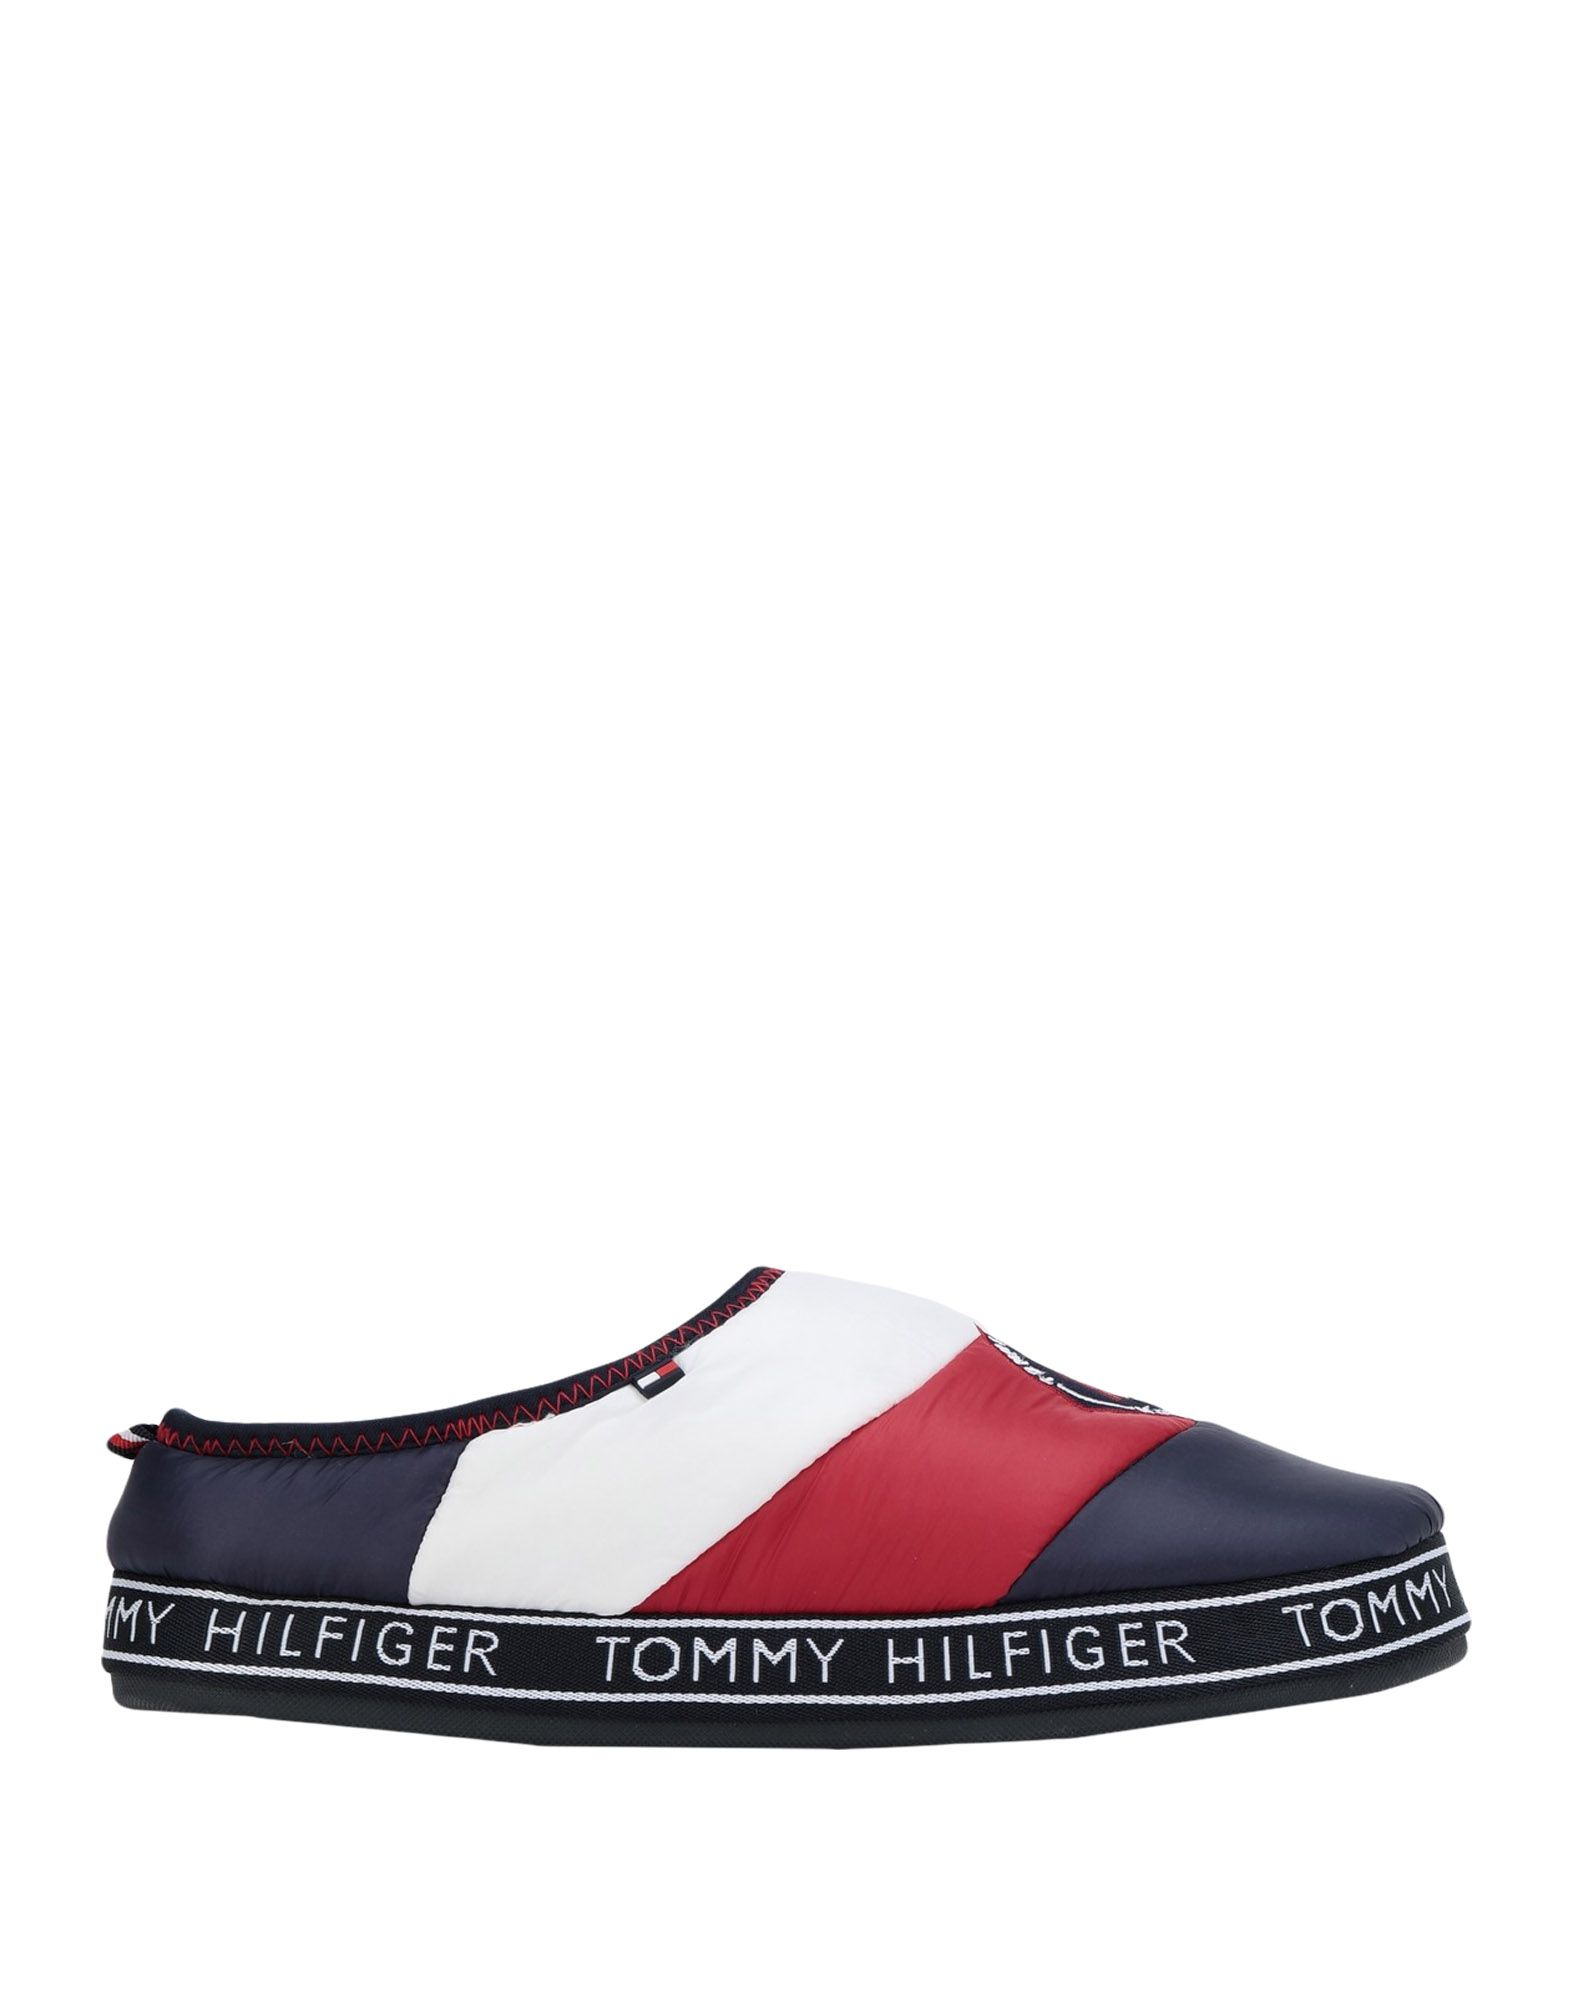 TOMMY HILFIGER Домашние туфли цены онлайн